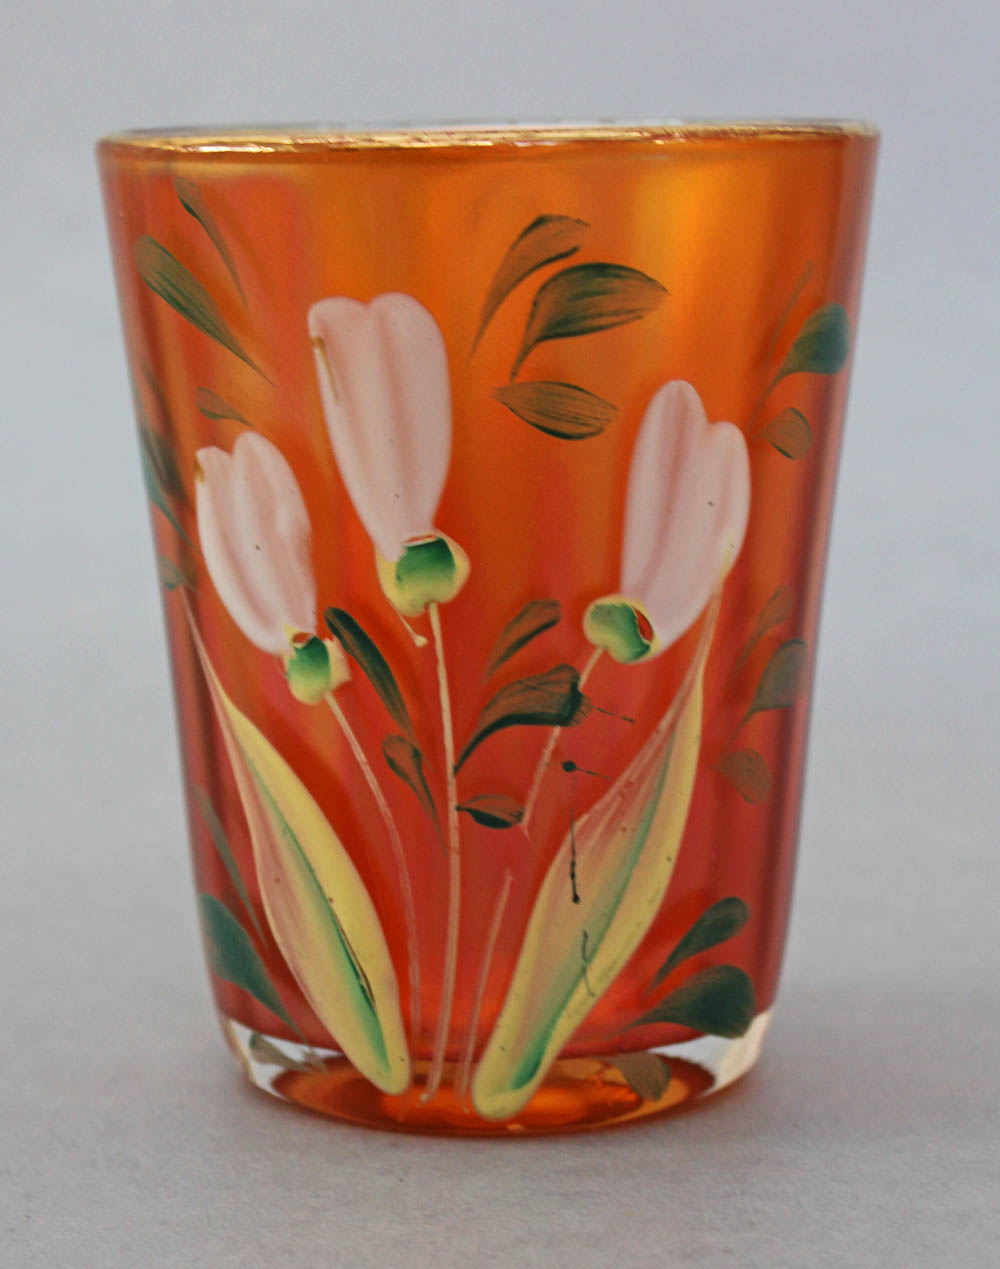 (Enameled) Crocus Variant#1/Enameled Freesia, marigold, Fenton